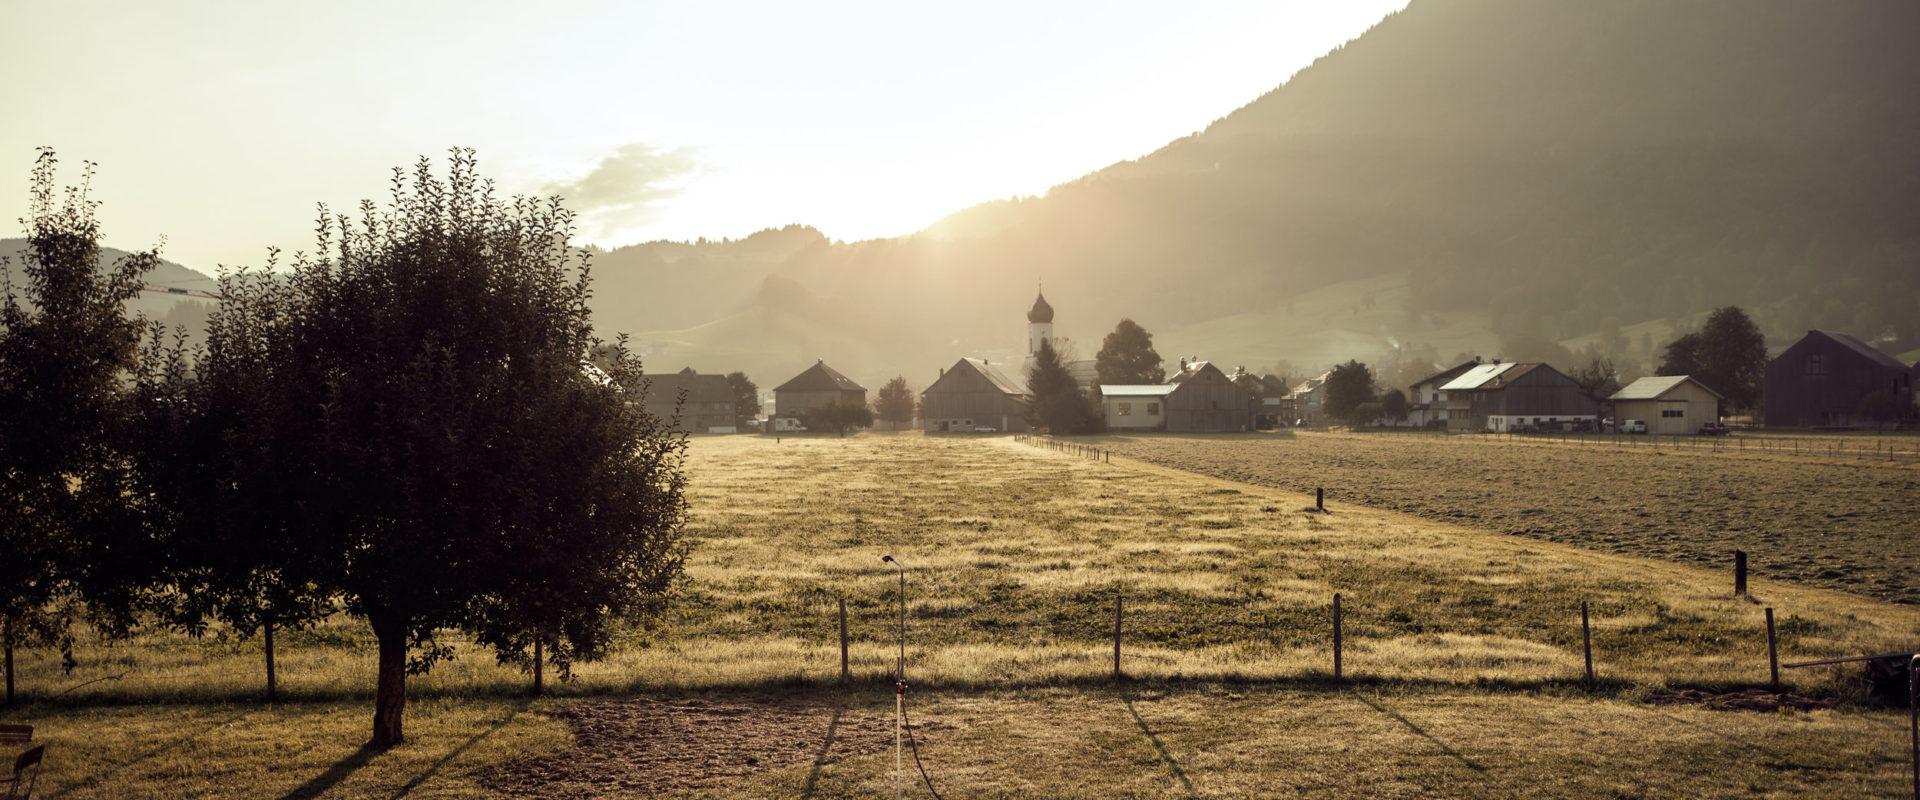 Landschaft © Ian Ehm / friendship.is